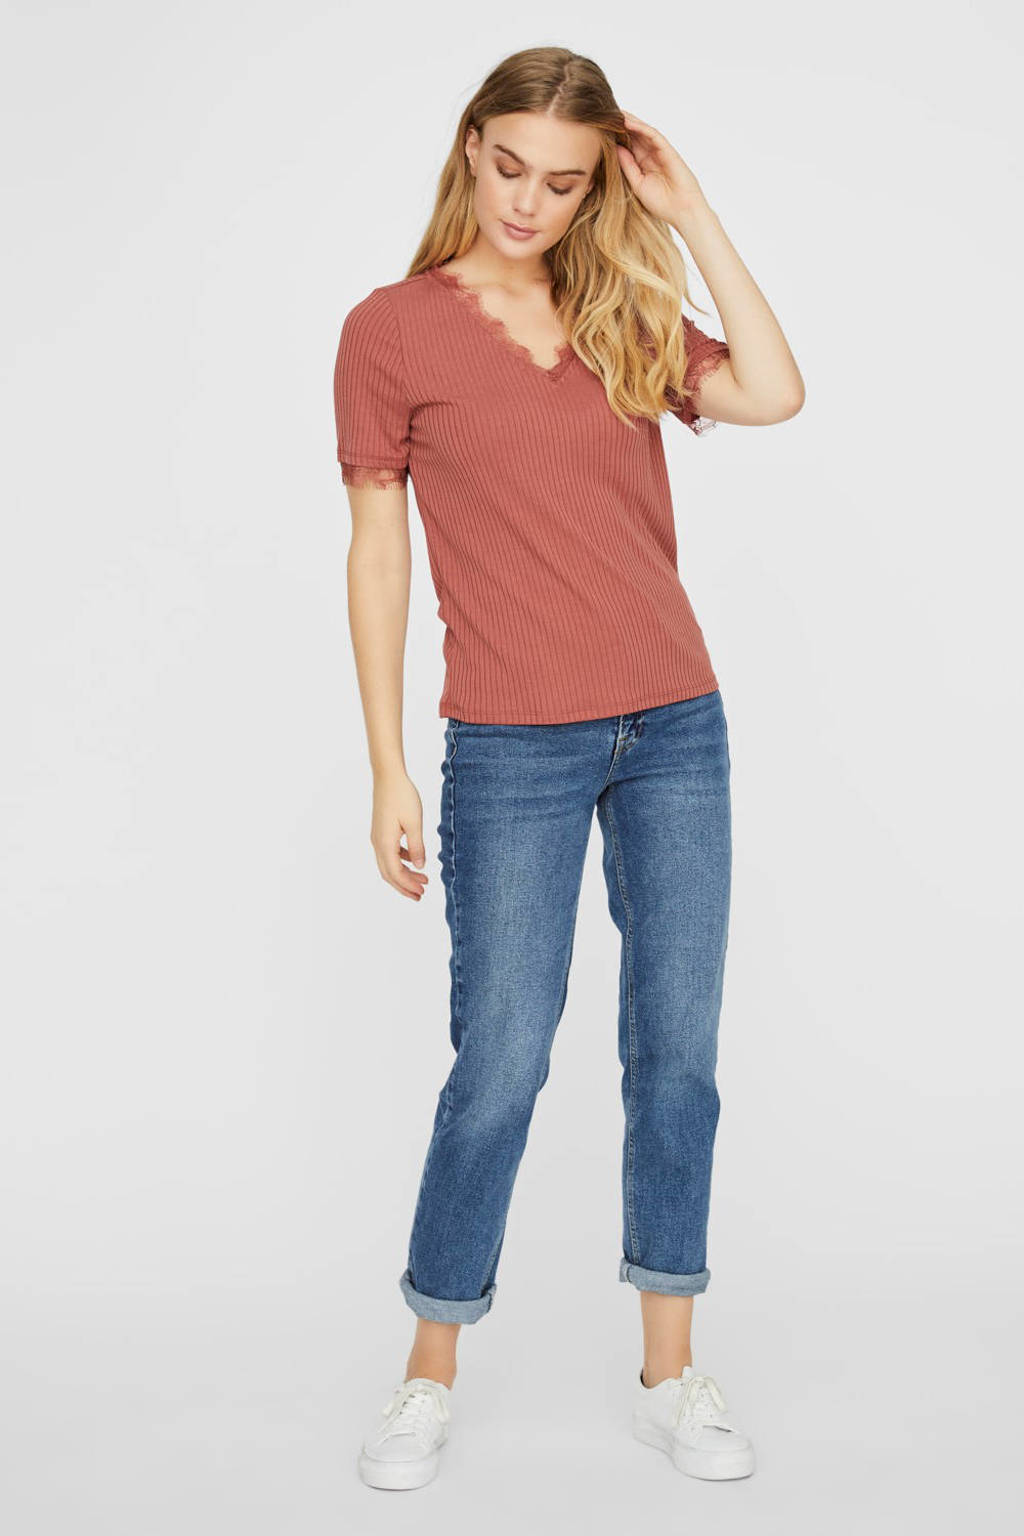 VERO MODA ribgebreid T-shirt met kant roze, Roze